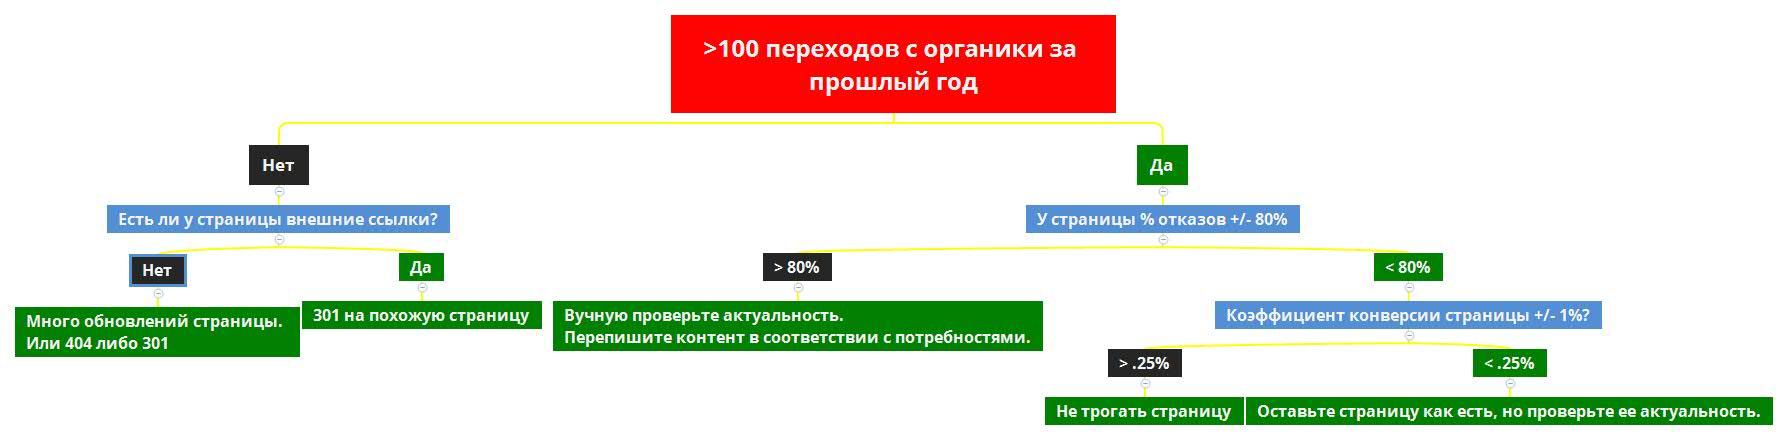 SEO аудит контента - диаграмма